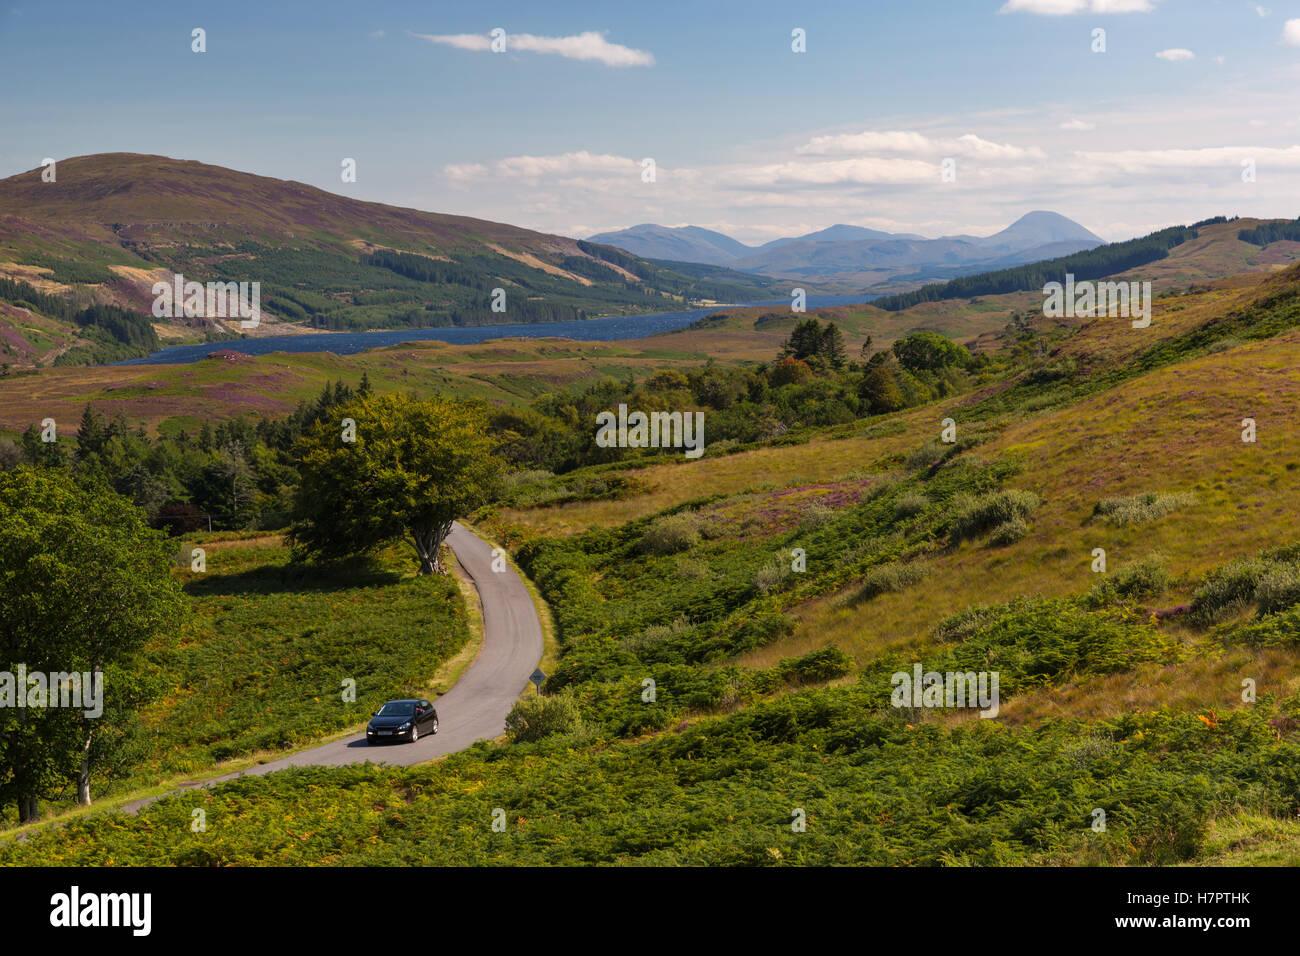 Country road, car cruising Isle of Mull. Highlands, Scotland, United Kingdom.  Summer scenery, landscape, nature. - Stock Image